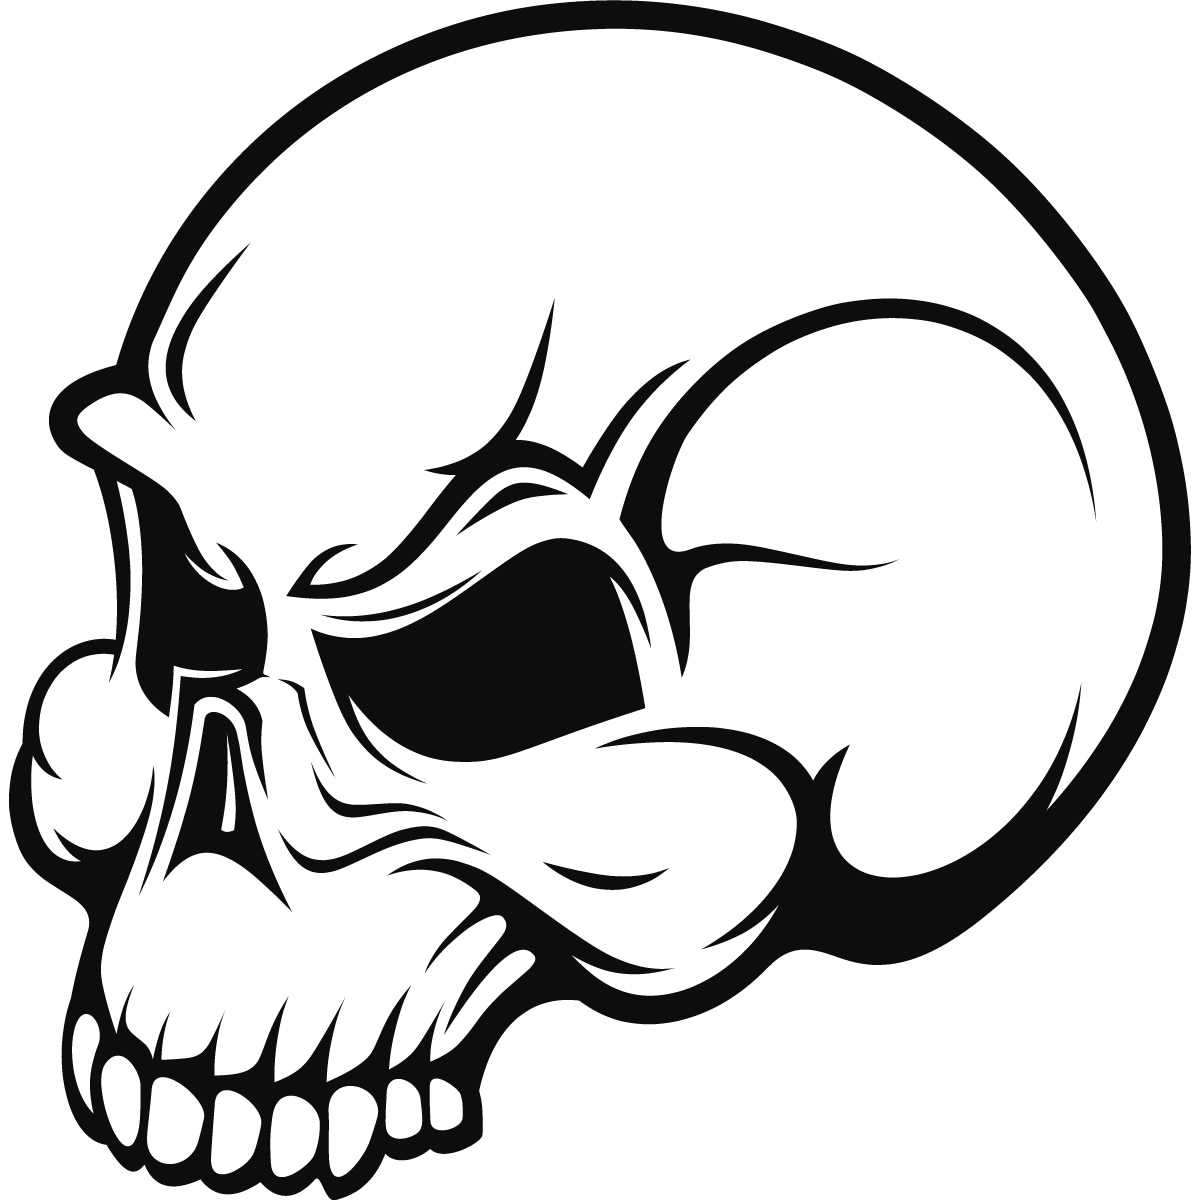 1200x1200 Drawings Of Really Scary Skulls Skull Drawings Pics Free